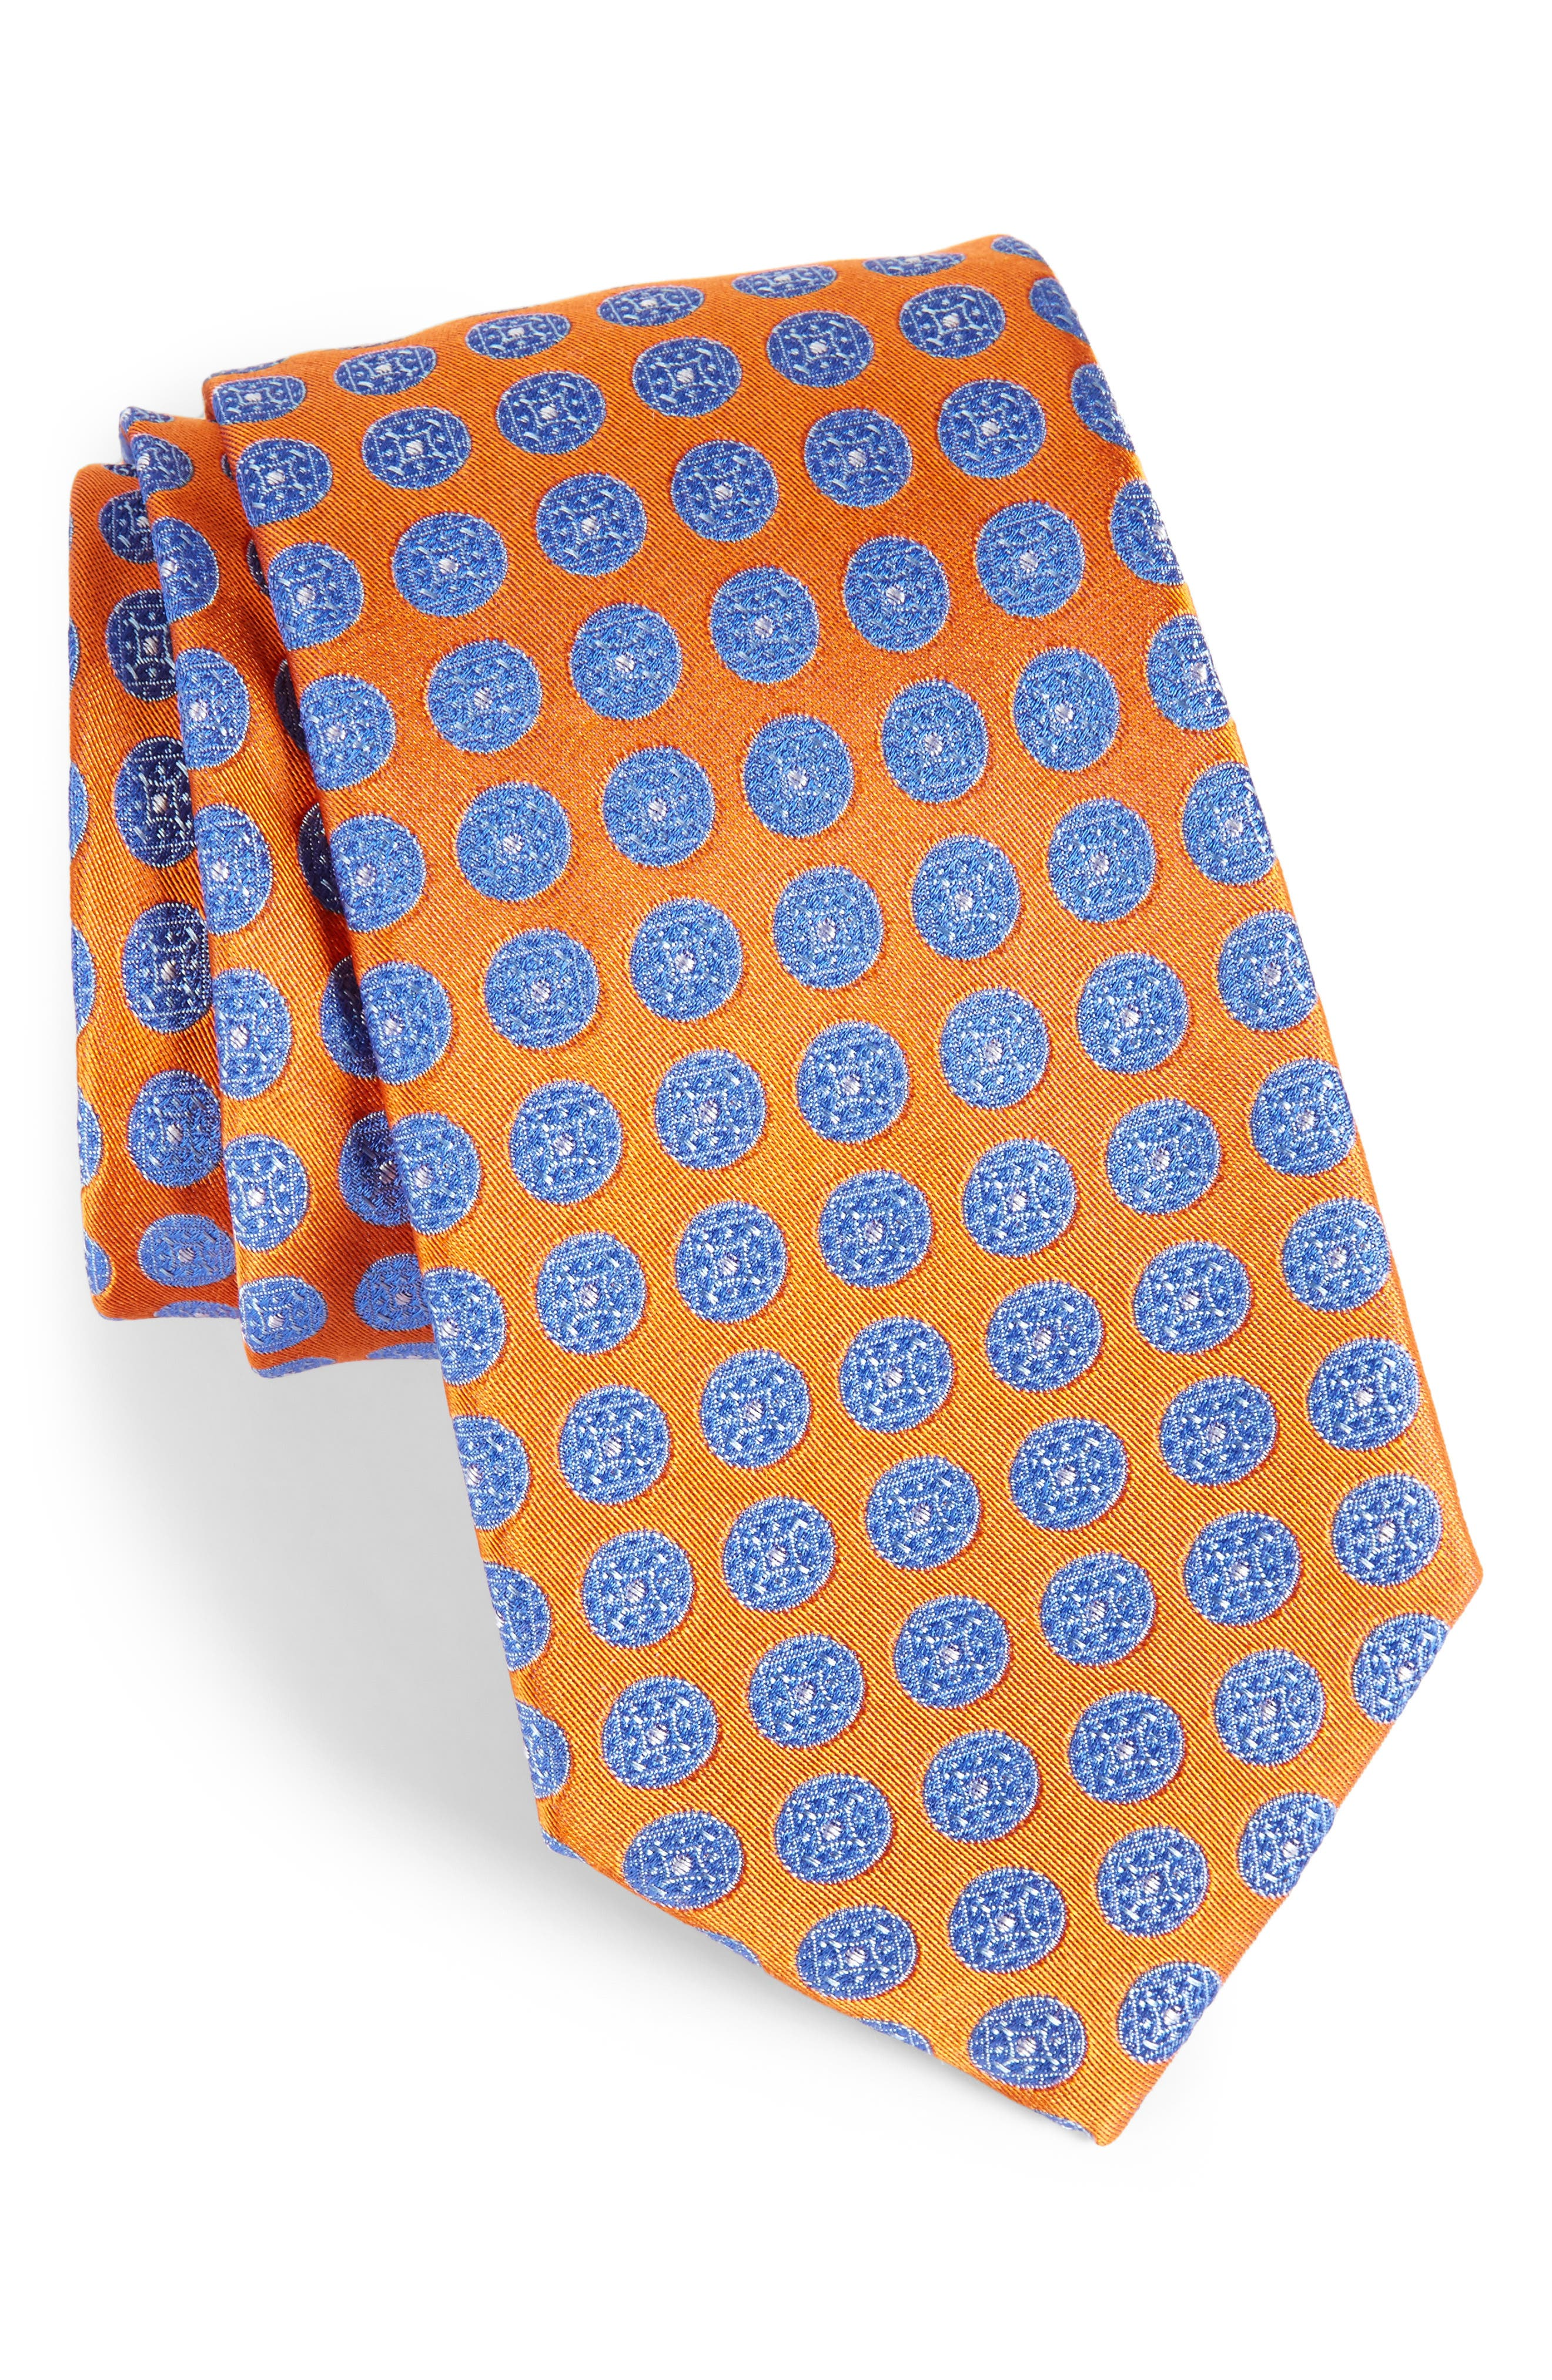 Alternate Image 1 Selected - Nordstrom Men's Shop Carlos Medallion Silk Tie (X-Long)